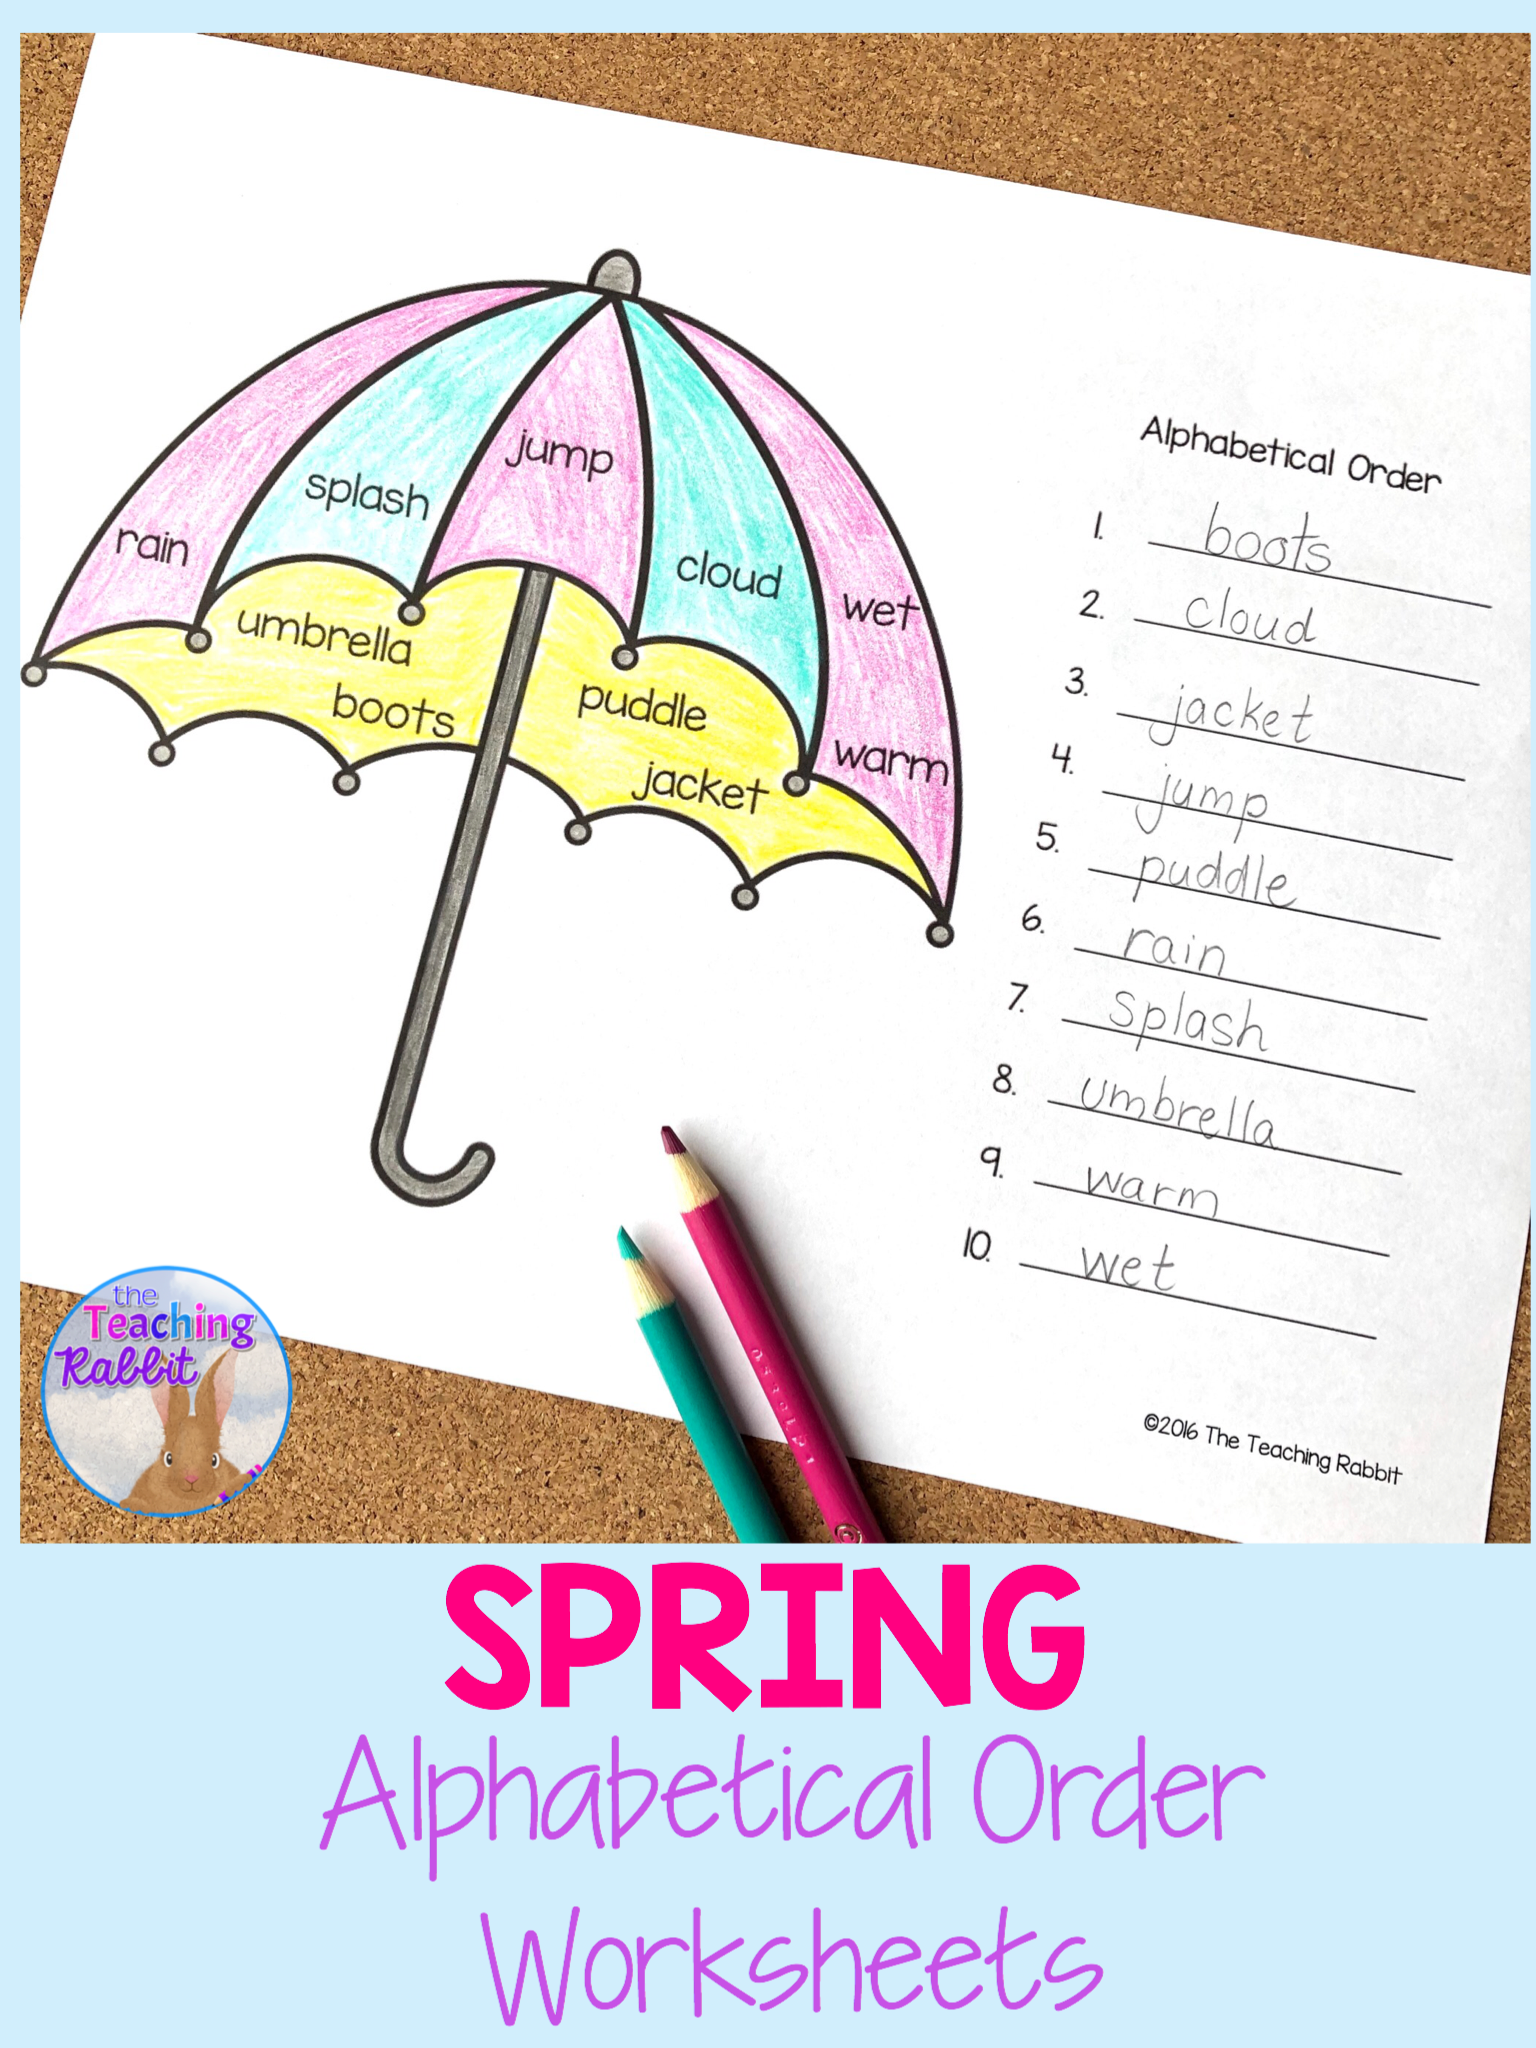 Alphabetical Order Center Spring Alphabetical Order Worksheets Spelling Activities Abc Order Worksheet [ 2048 x 1536 Pixel ]